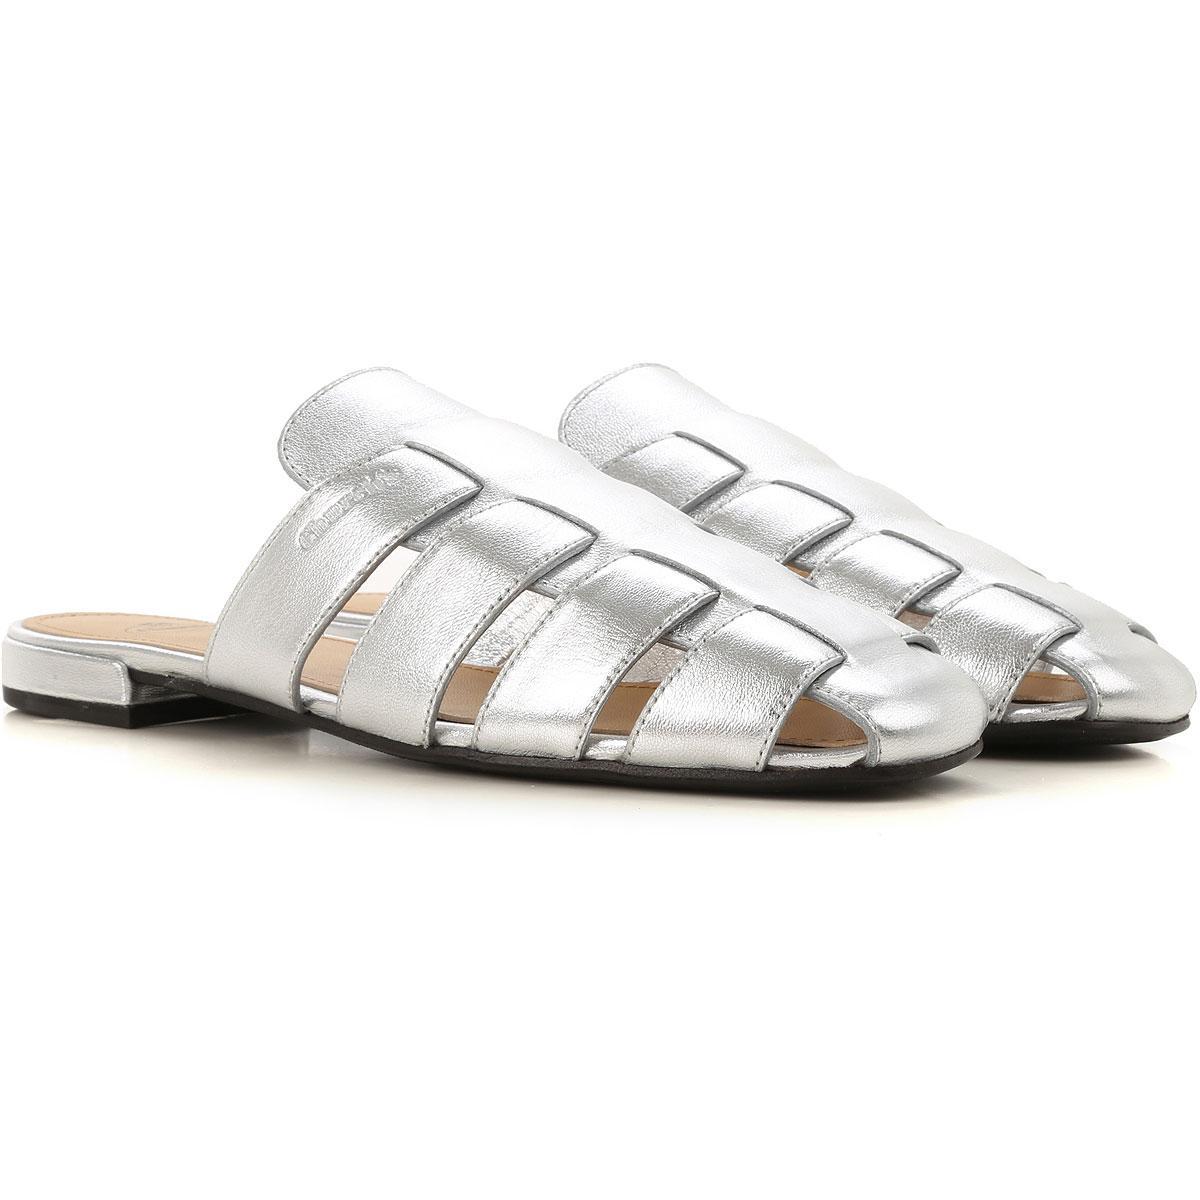 317221c9d45 Lyst - Church s Sandals For Women in Metallic